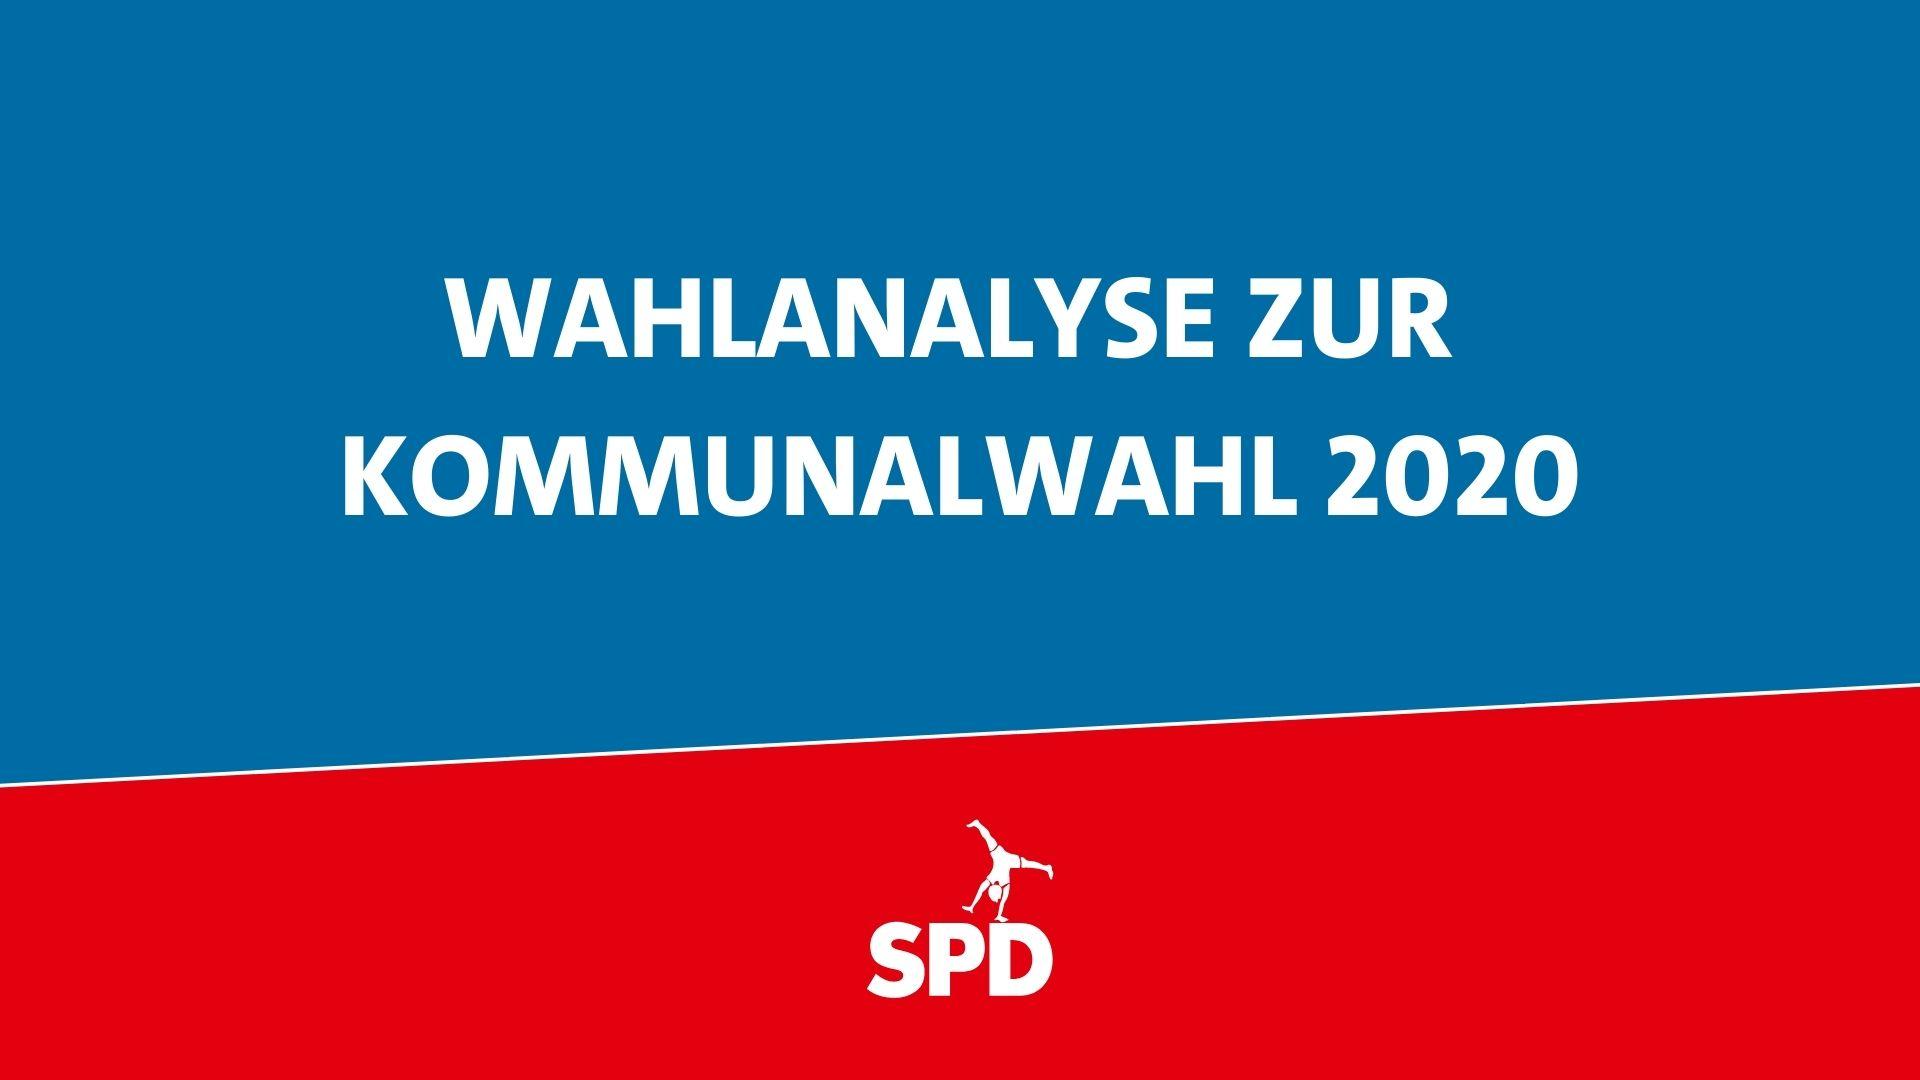 Wahlanalyse_Kommunalwahl_2020